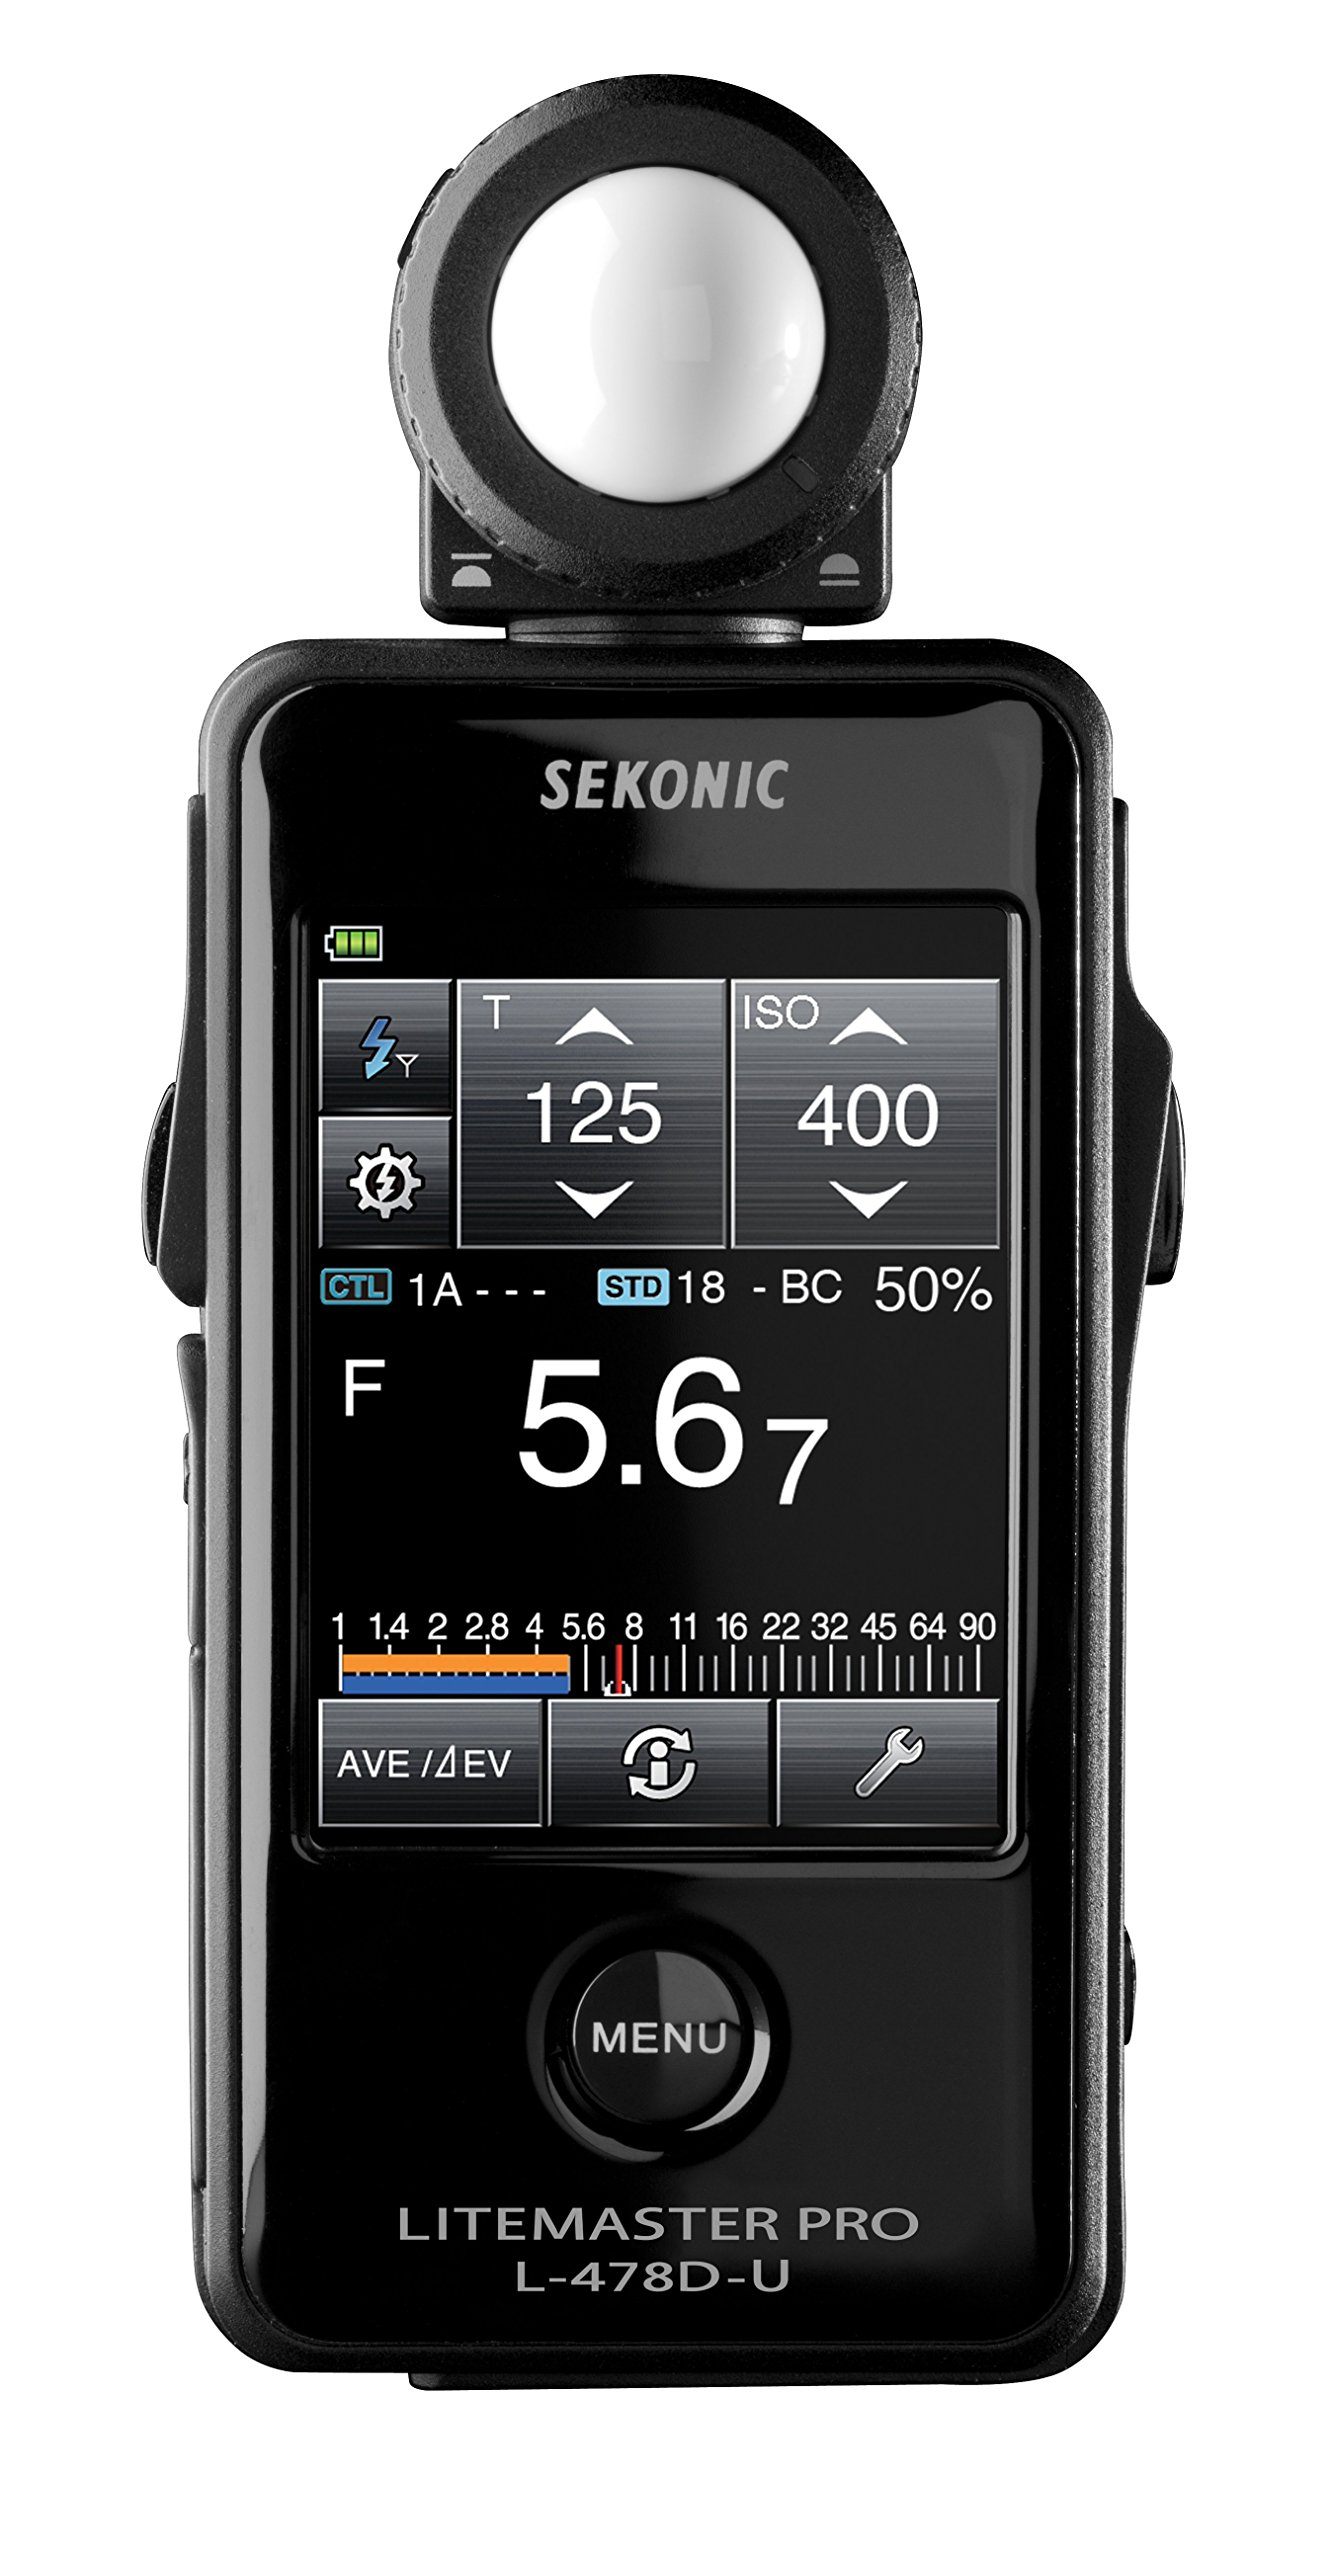 Sekonic LiteMaster Pro L-478D-U Light Meter (401-474) by Sekonic